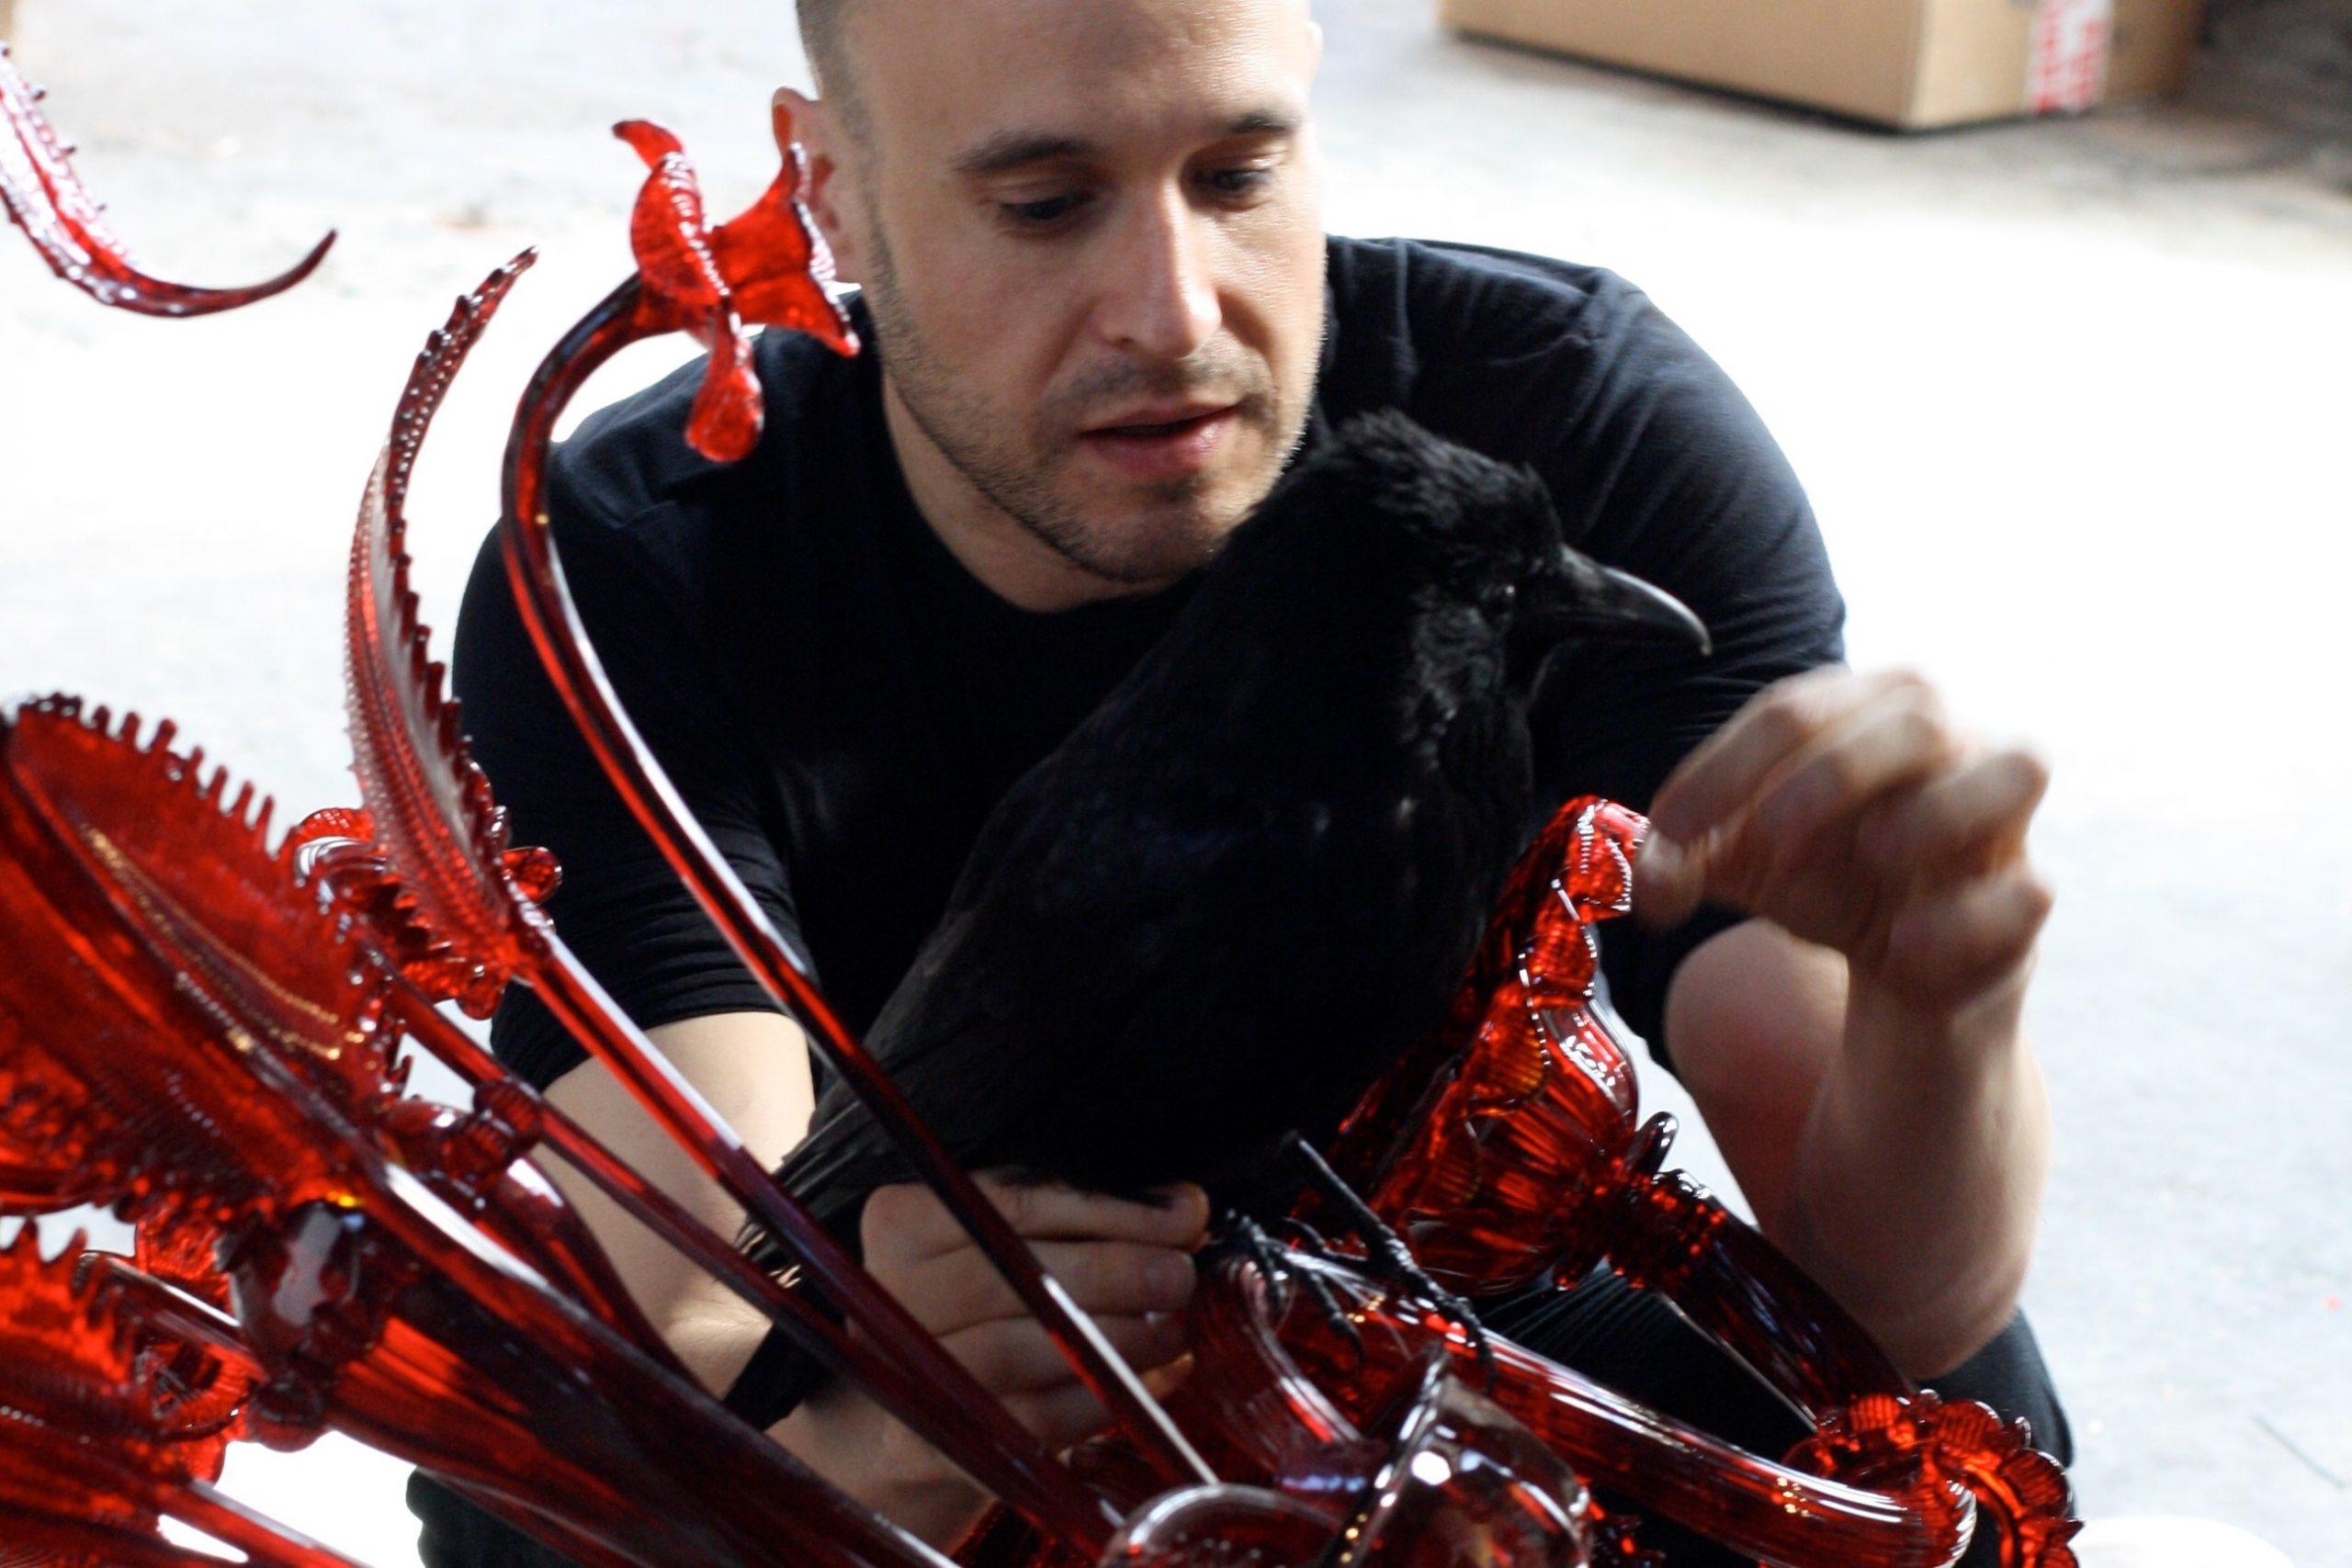 Javier Pérez installing Carroña